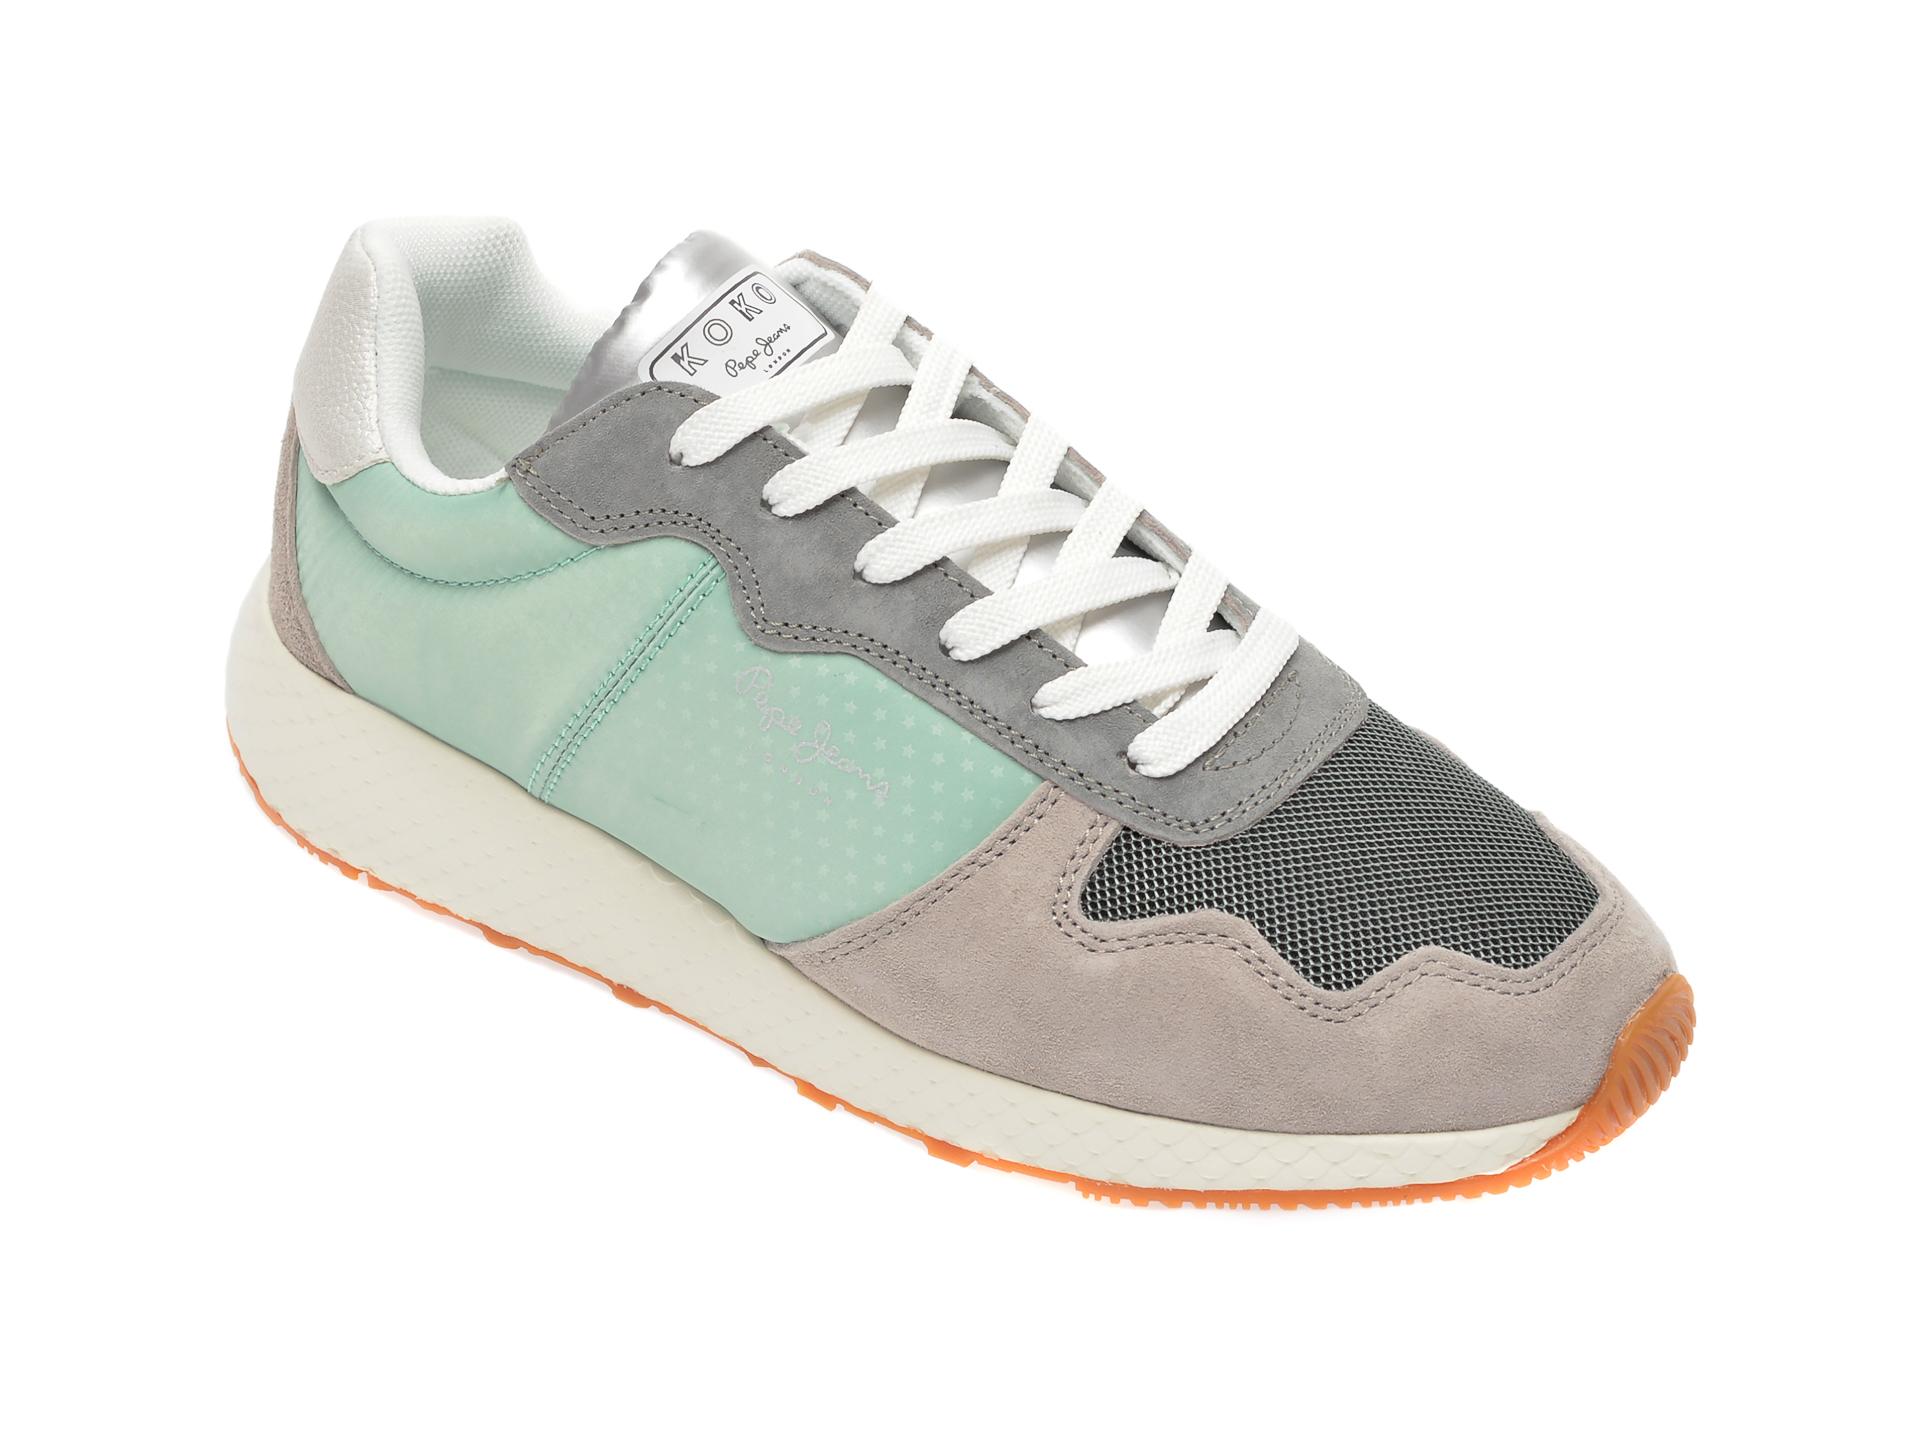 Pantofi sport PEPE JEANS verzi, LS30996, din material textil si piele naturala